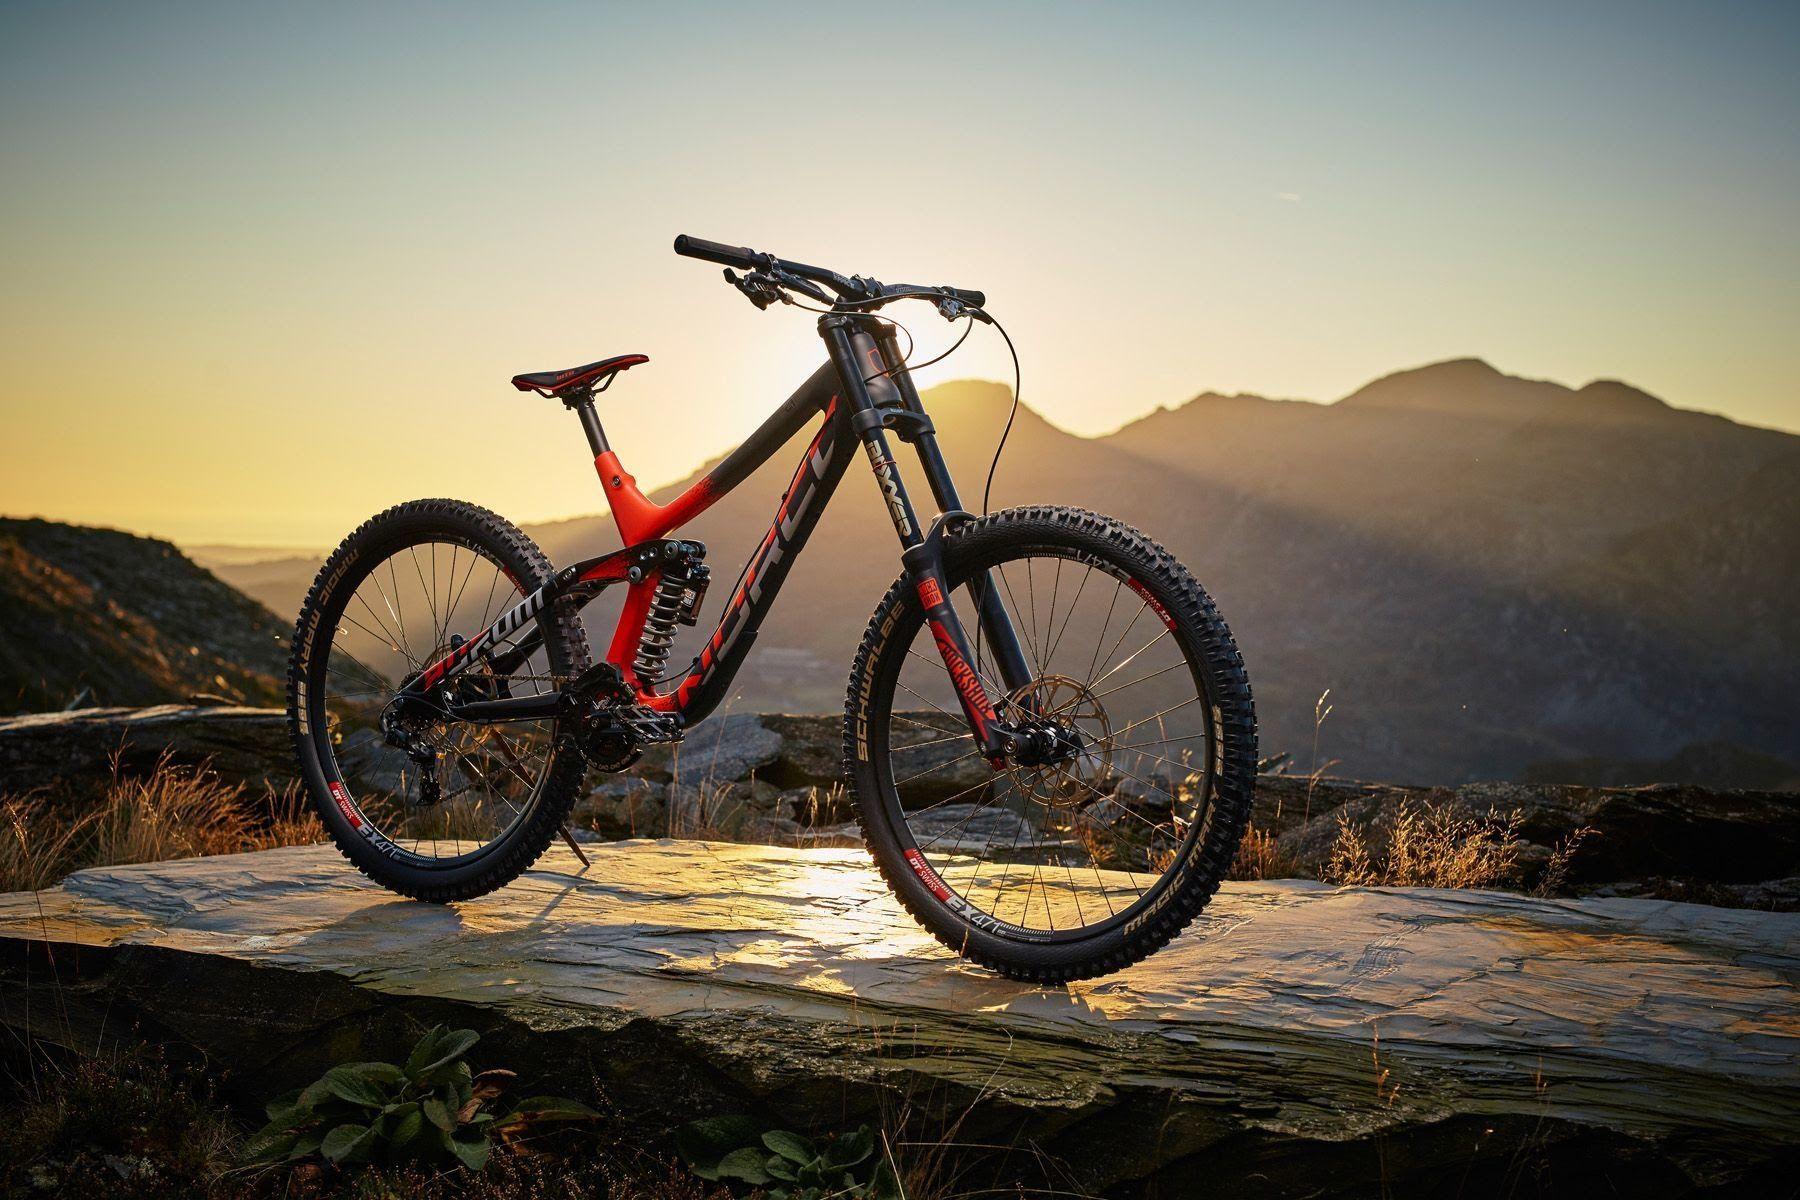 d40dac29bac BEST NEW DOWNHILL BIKES 2016 - 2017 !!! TOP 10 | bici pure lifestyle ...